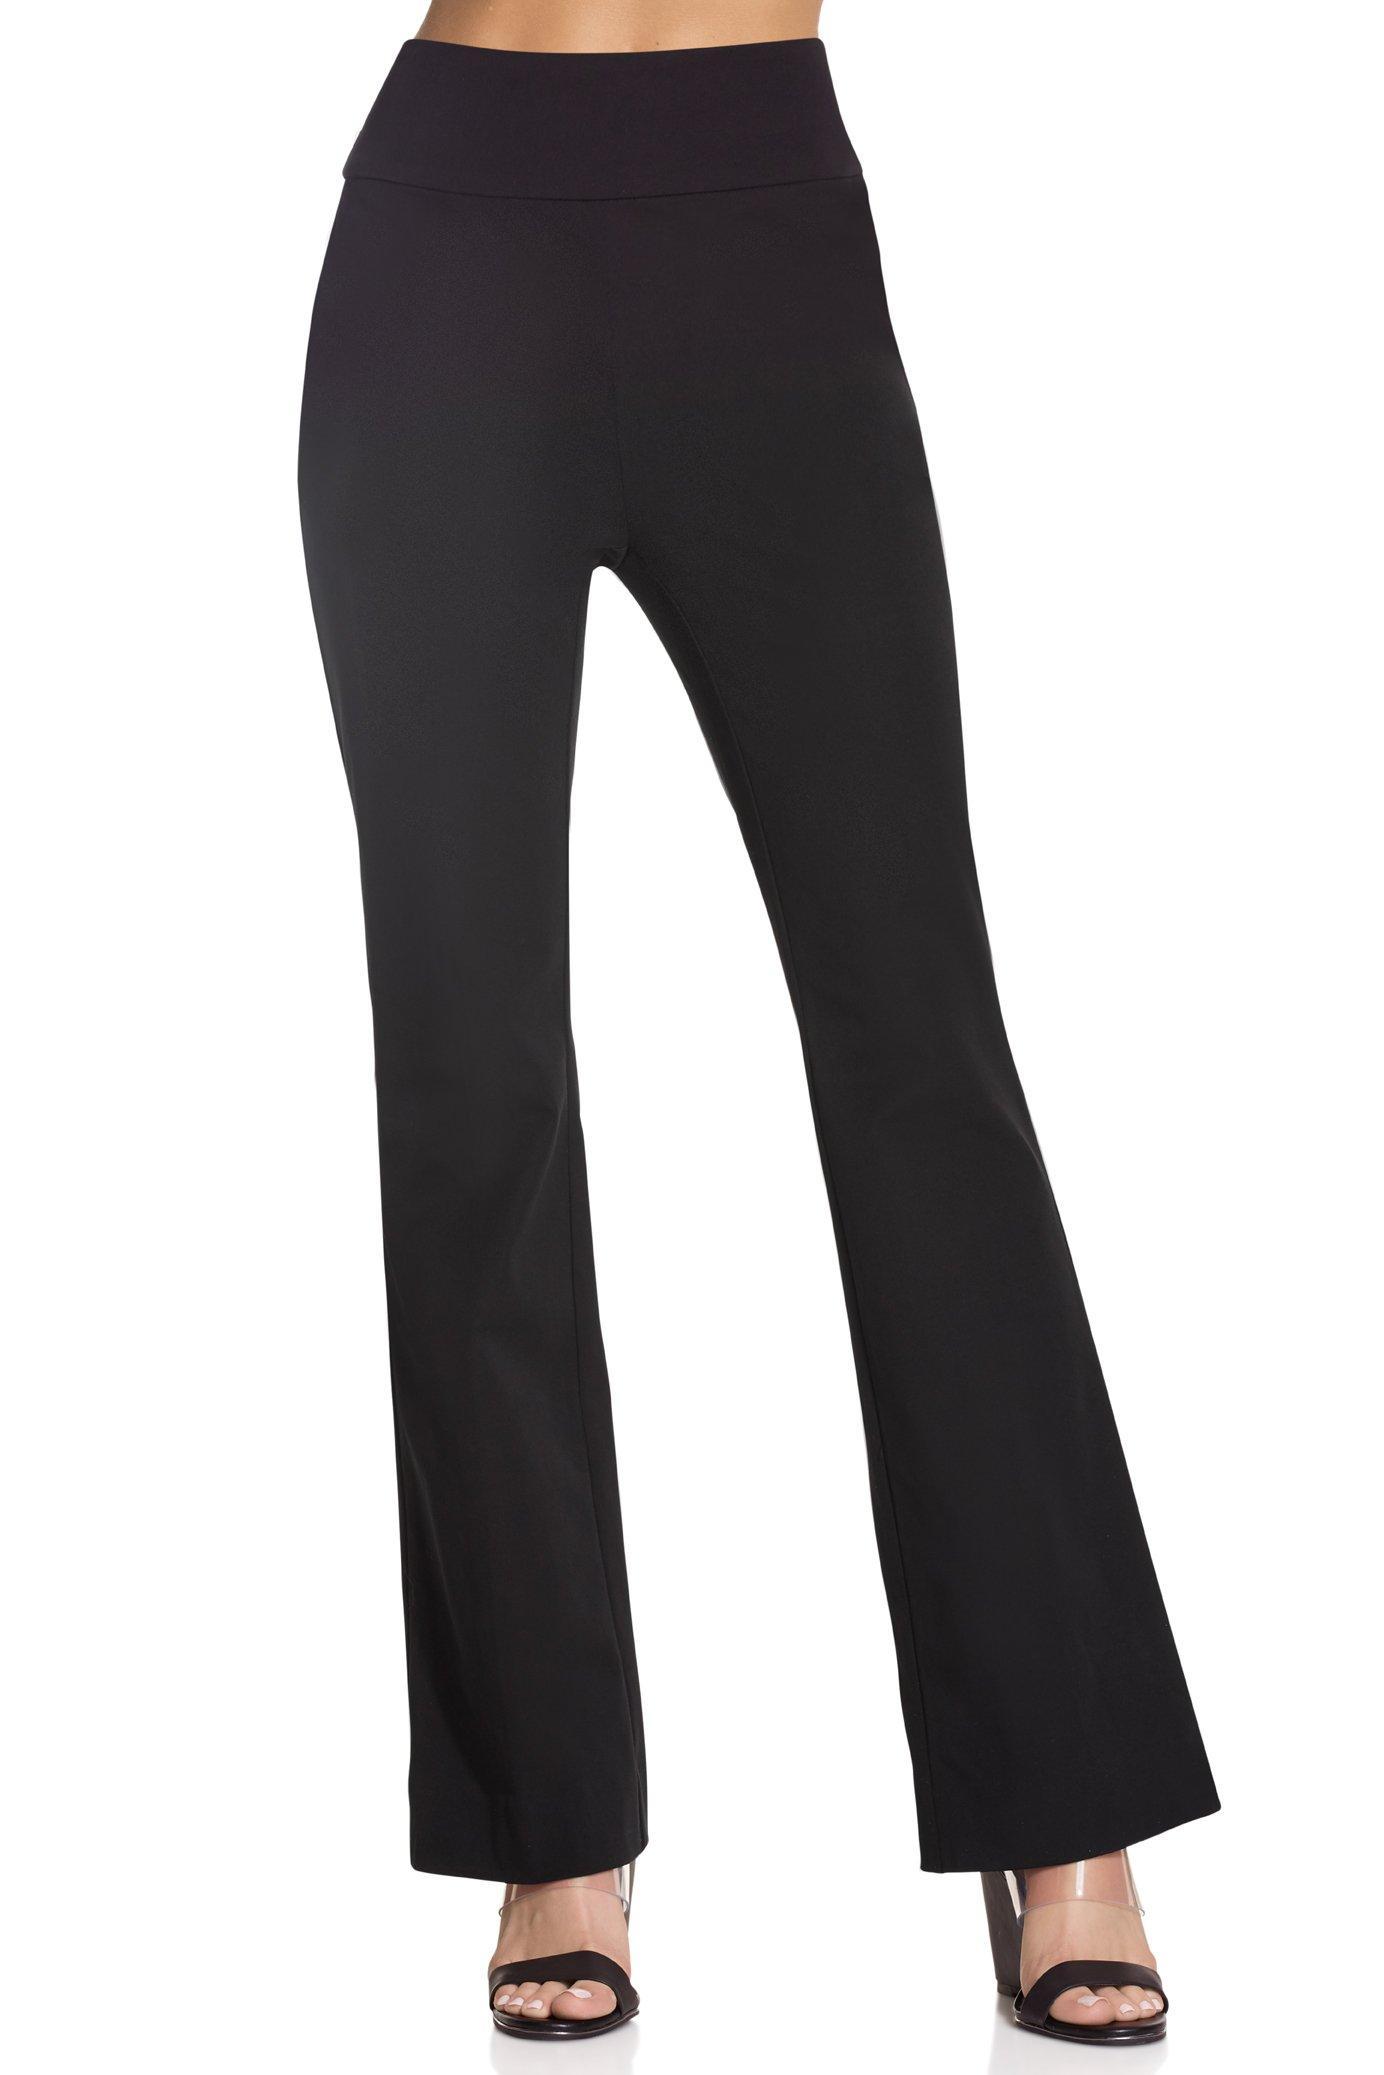 Bootcut side zip pants elastic waist